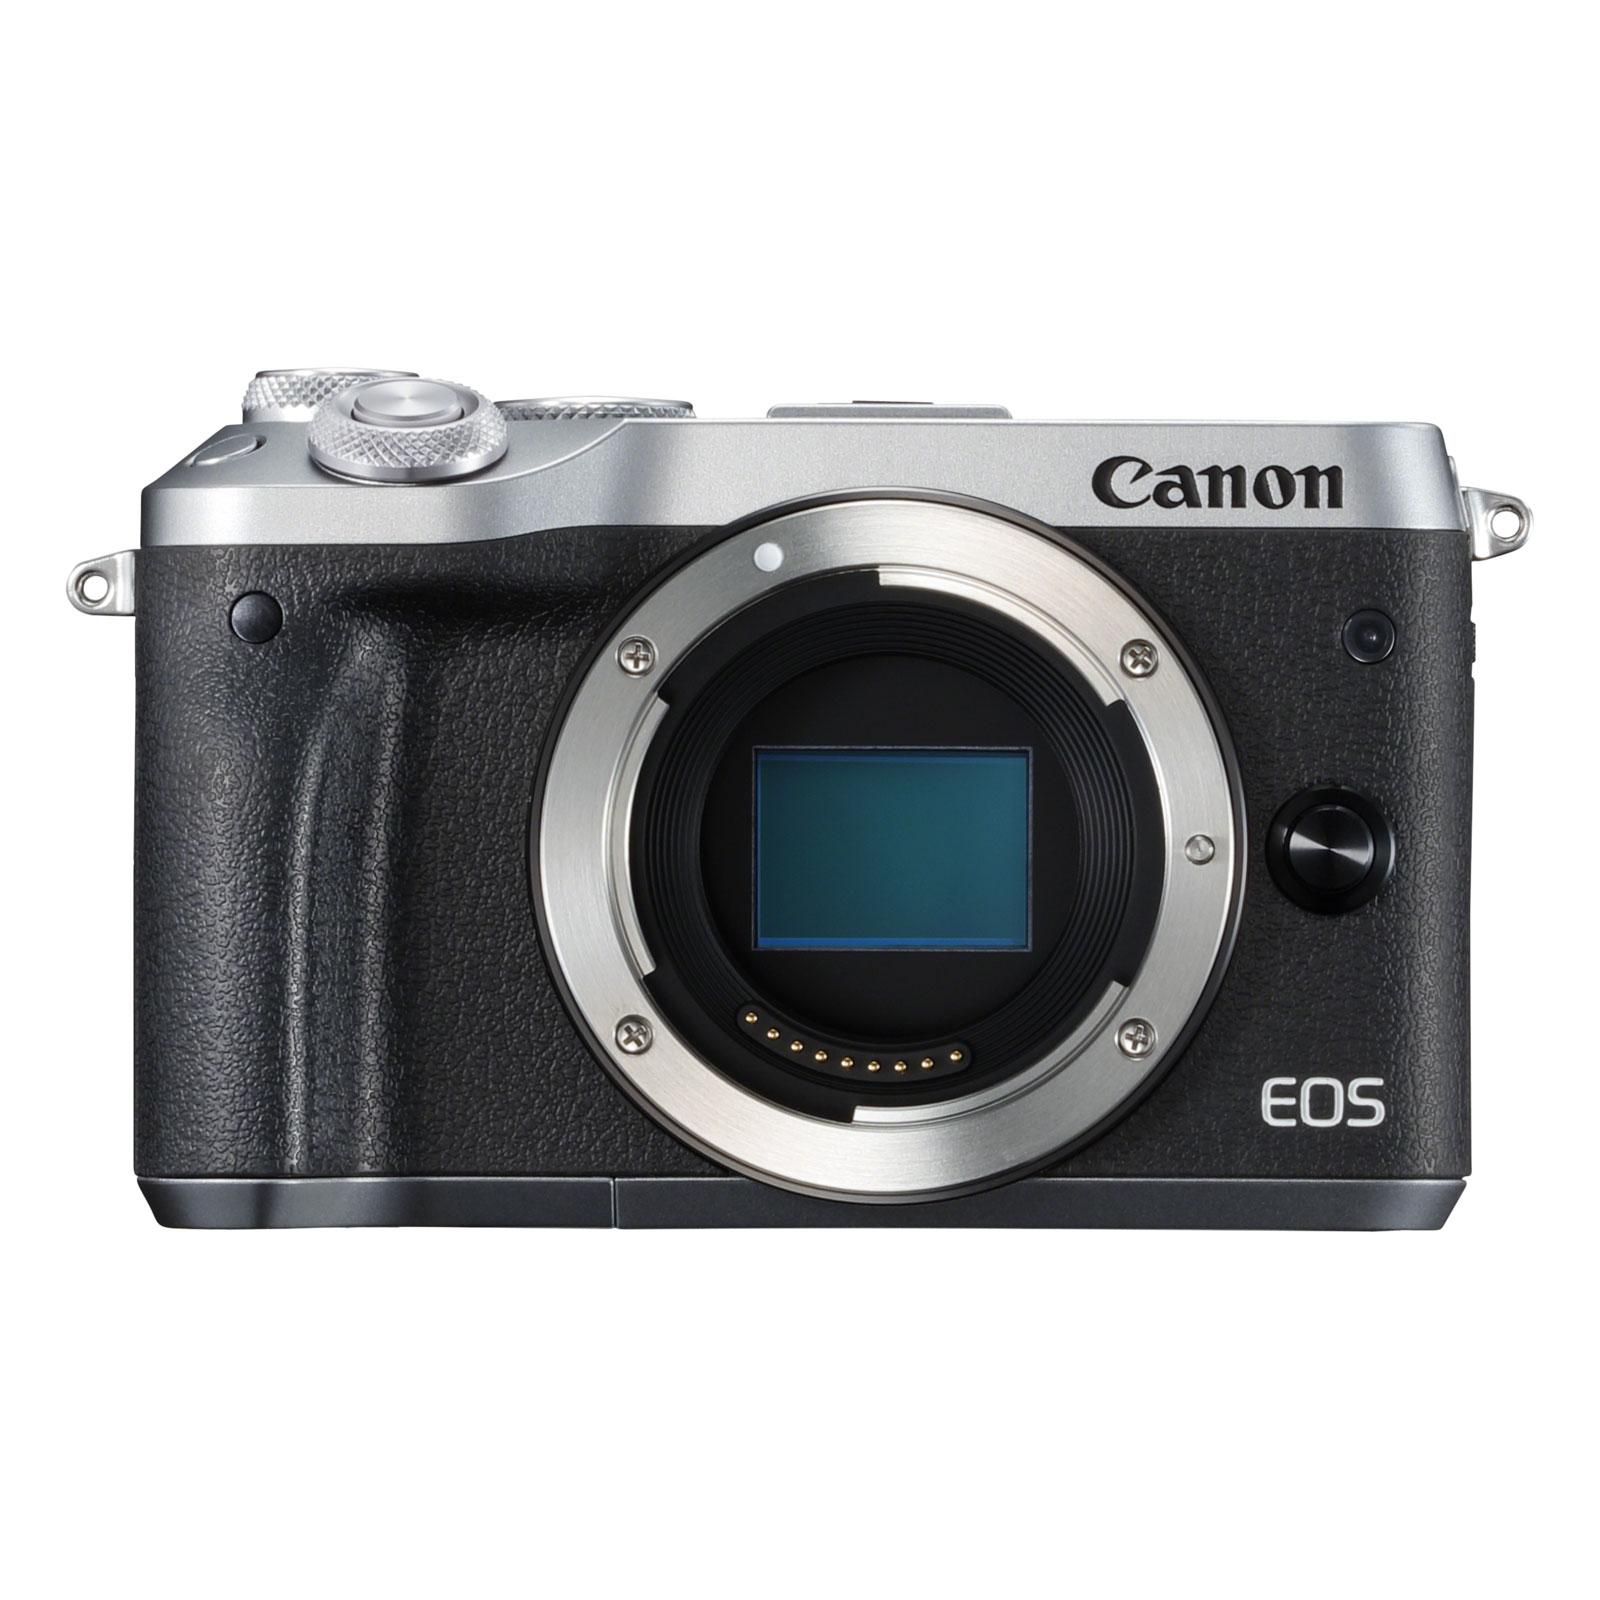 Canon eos m6 argent appareil photo hybride canon sur for Ecran appareil photo canon